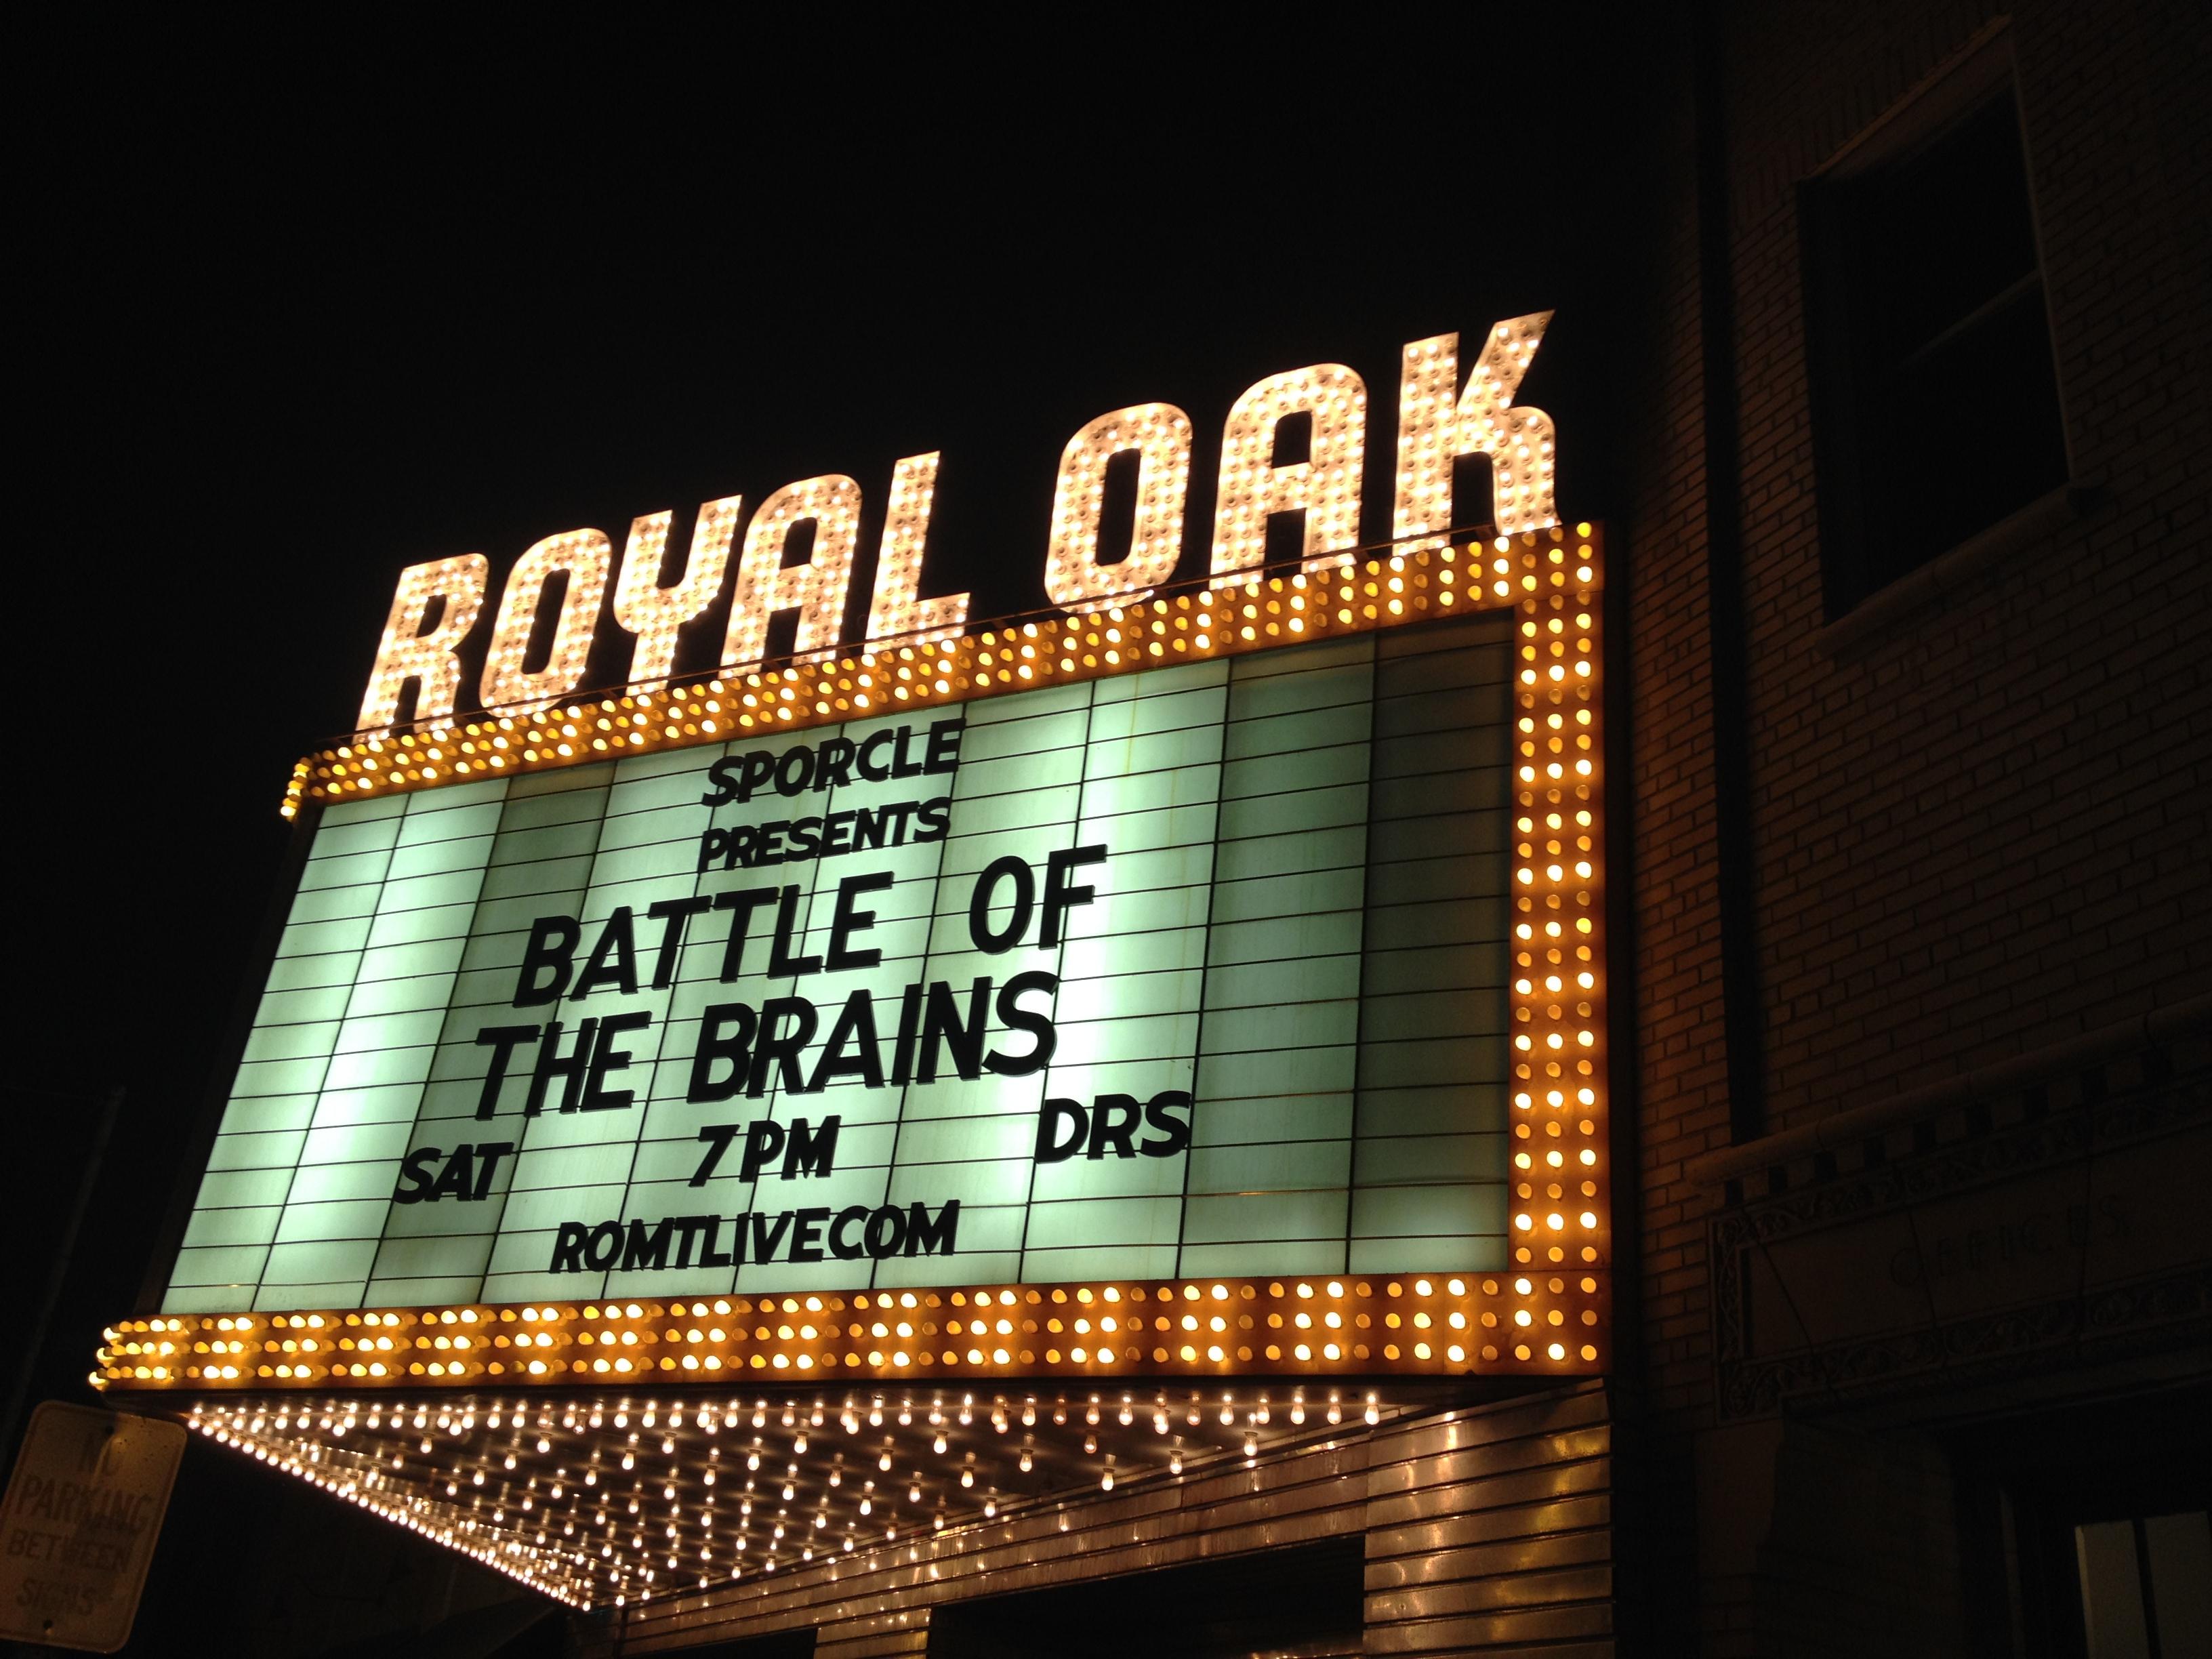 Battle of the brains 2013 recap sporcle blog for Motor city carpet royal oak